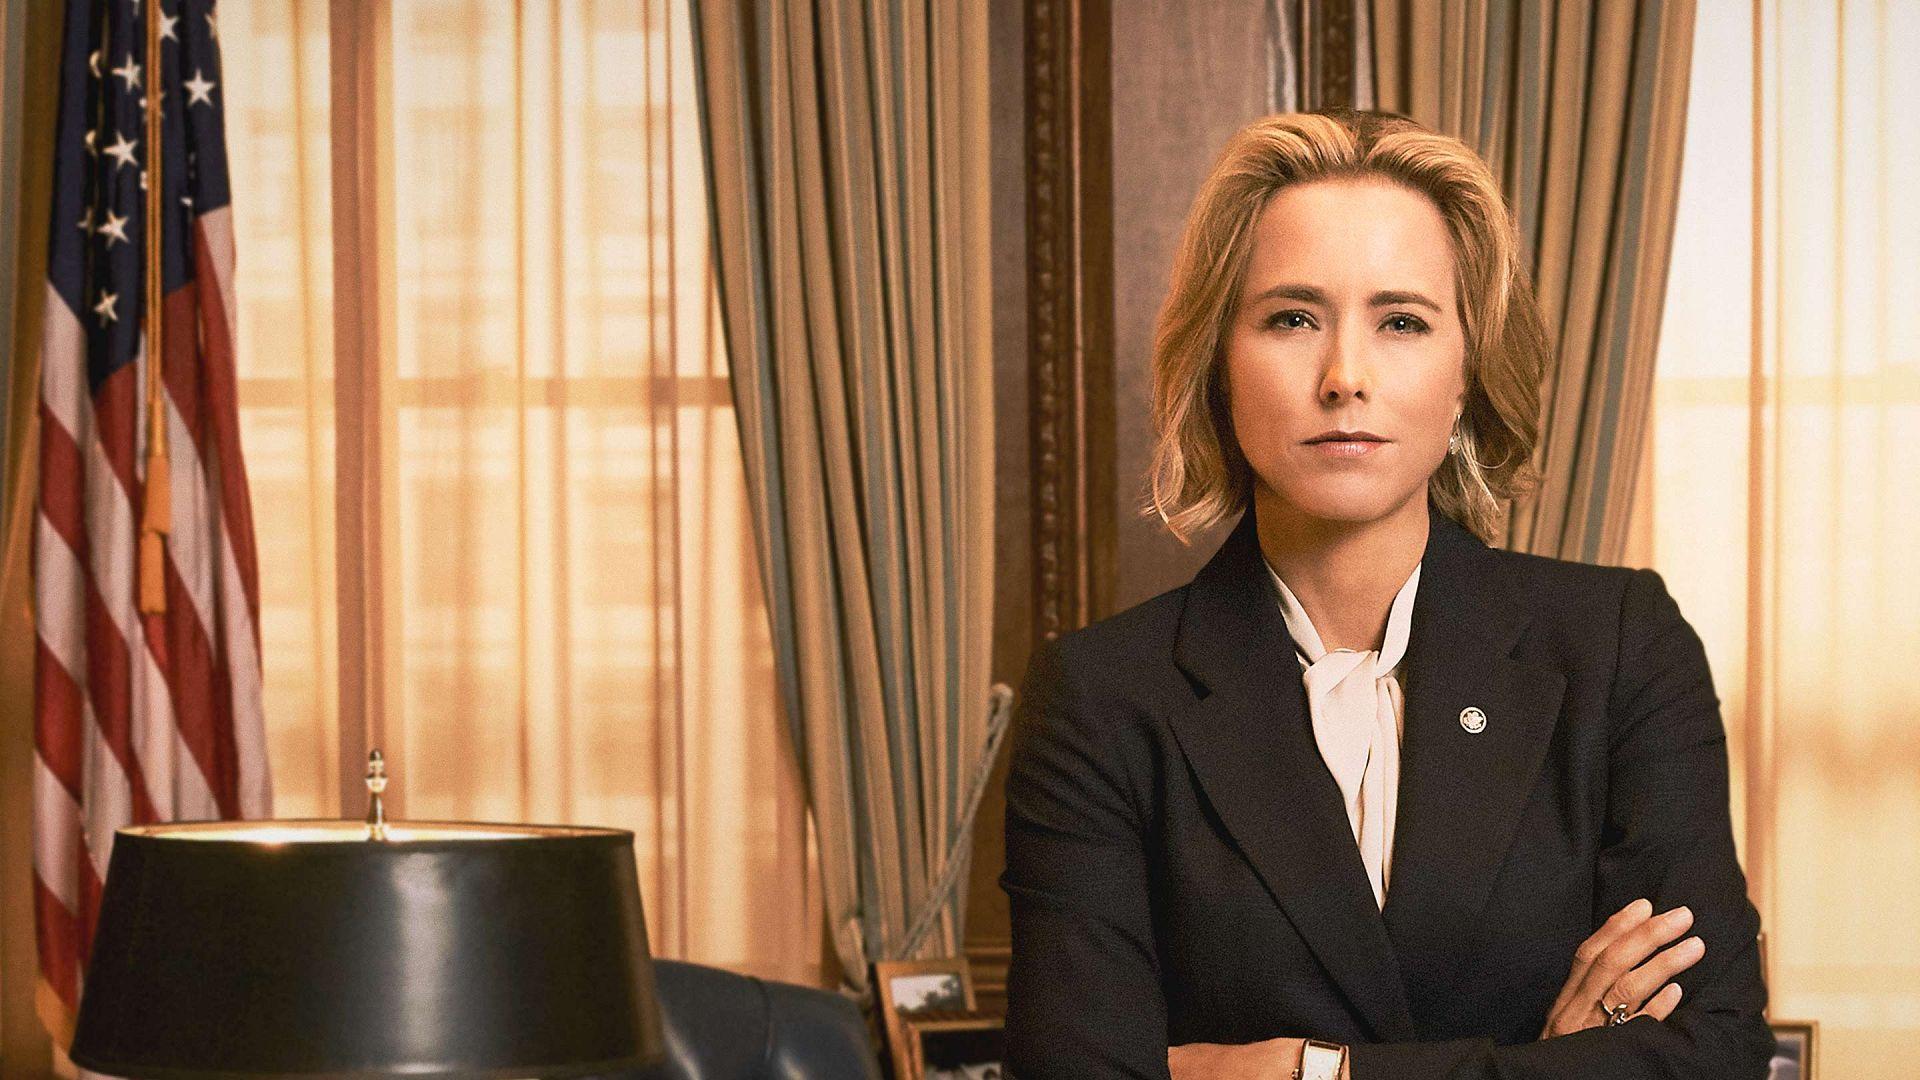 Madam Secretary Cbs Watch On Paramount Plus